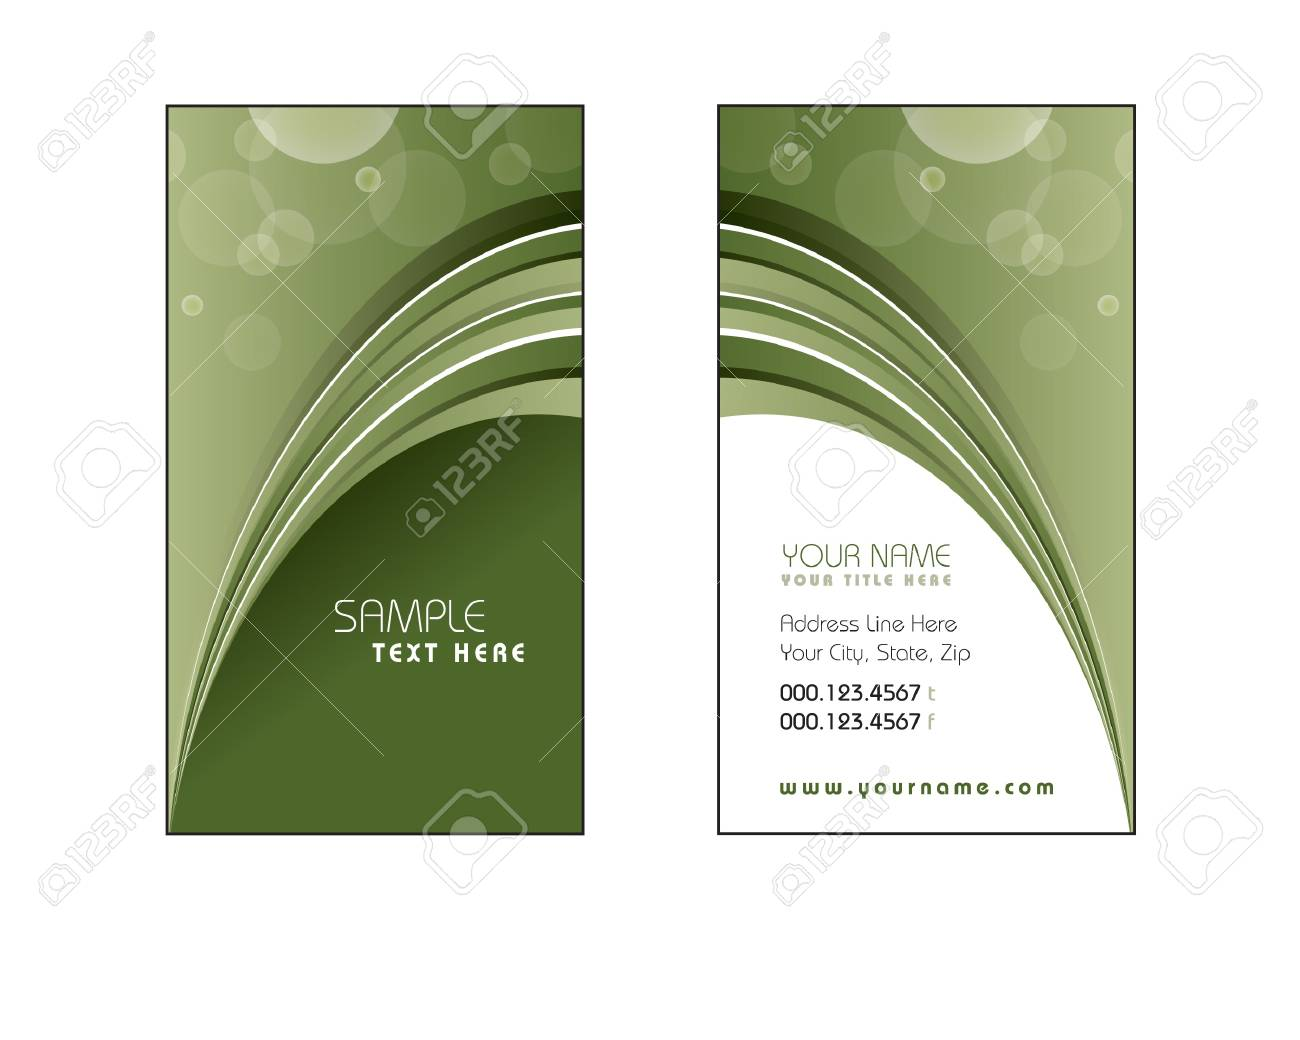 Business Card Template  Vector Eps10 Stock Vector - 14893795